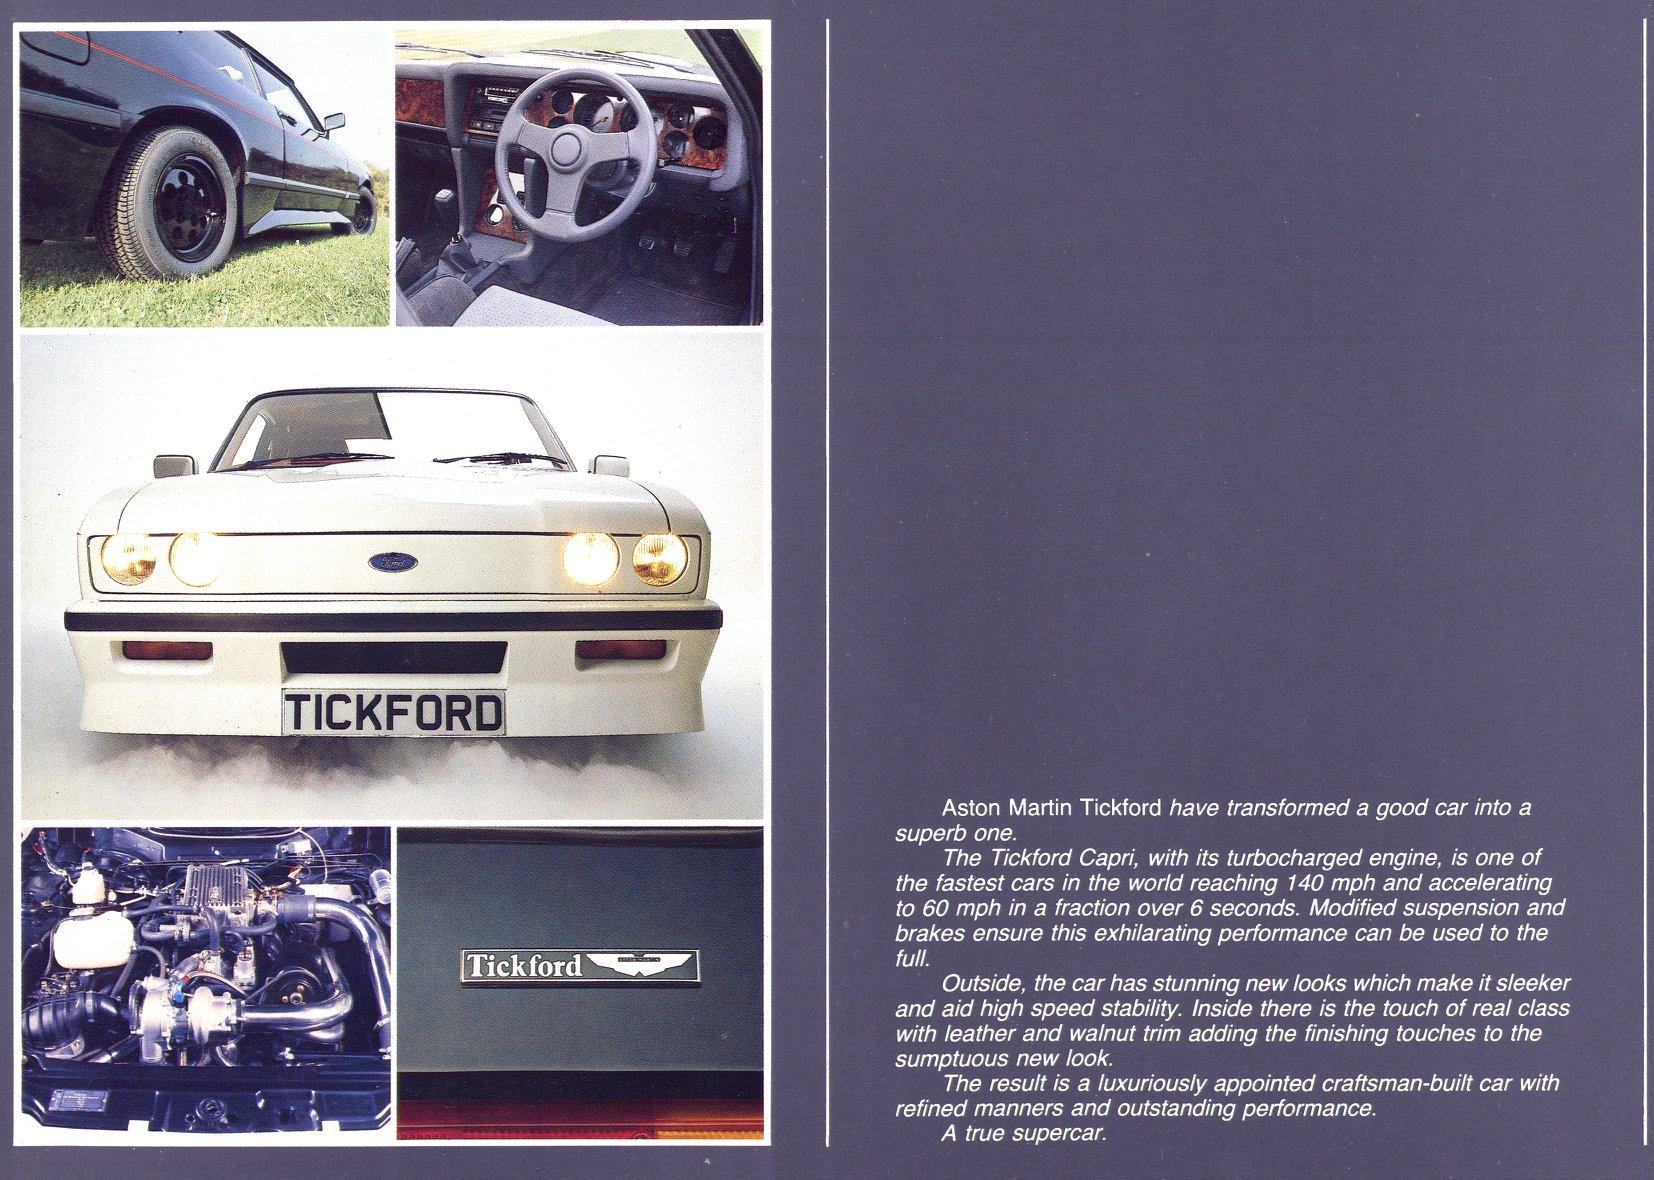 Tickford-brosjyre-11